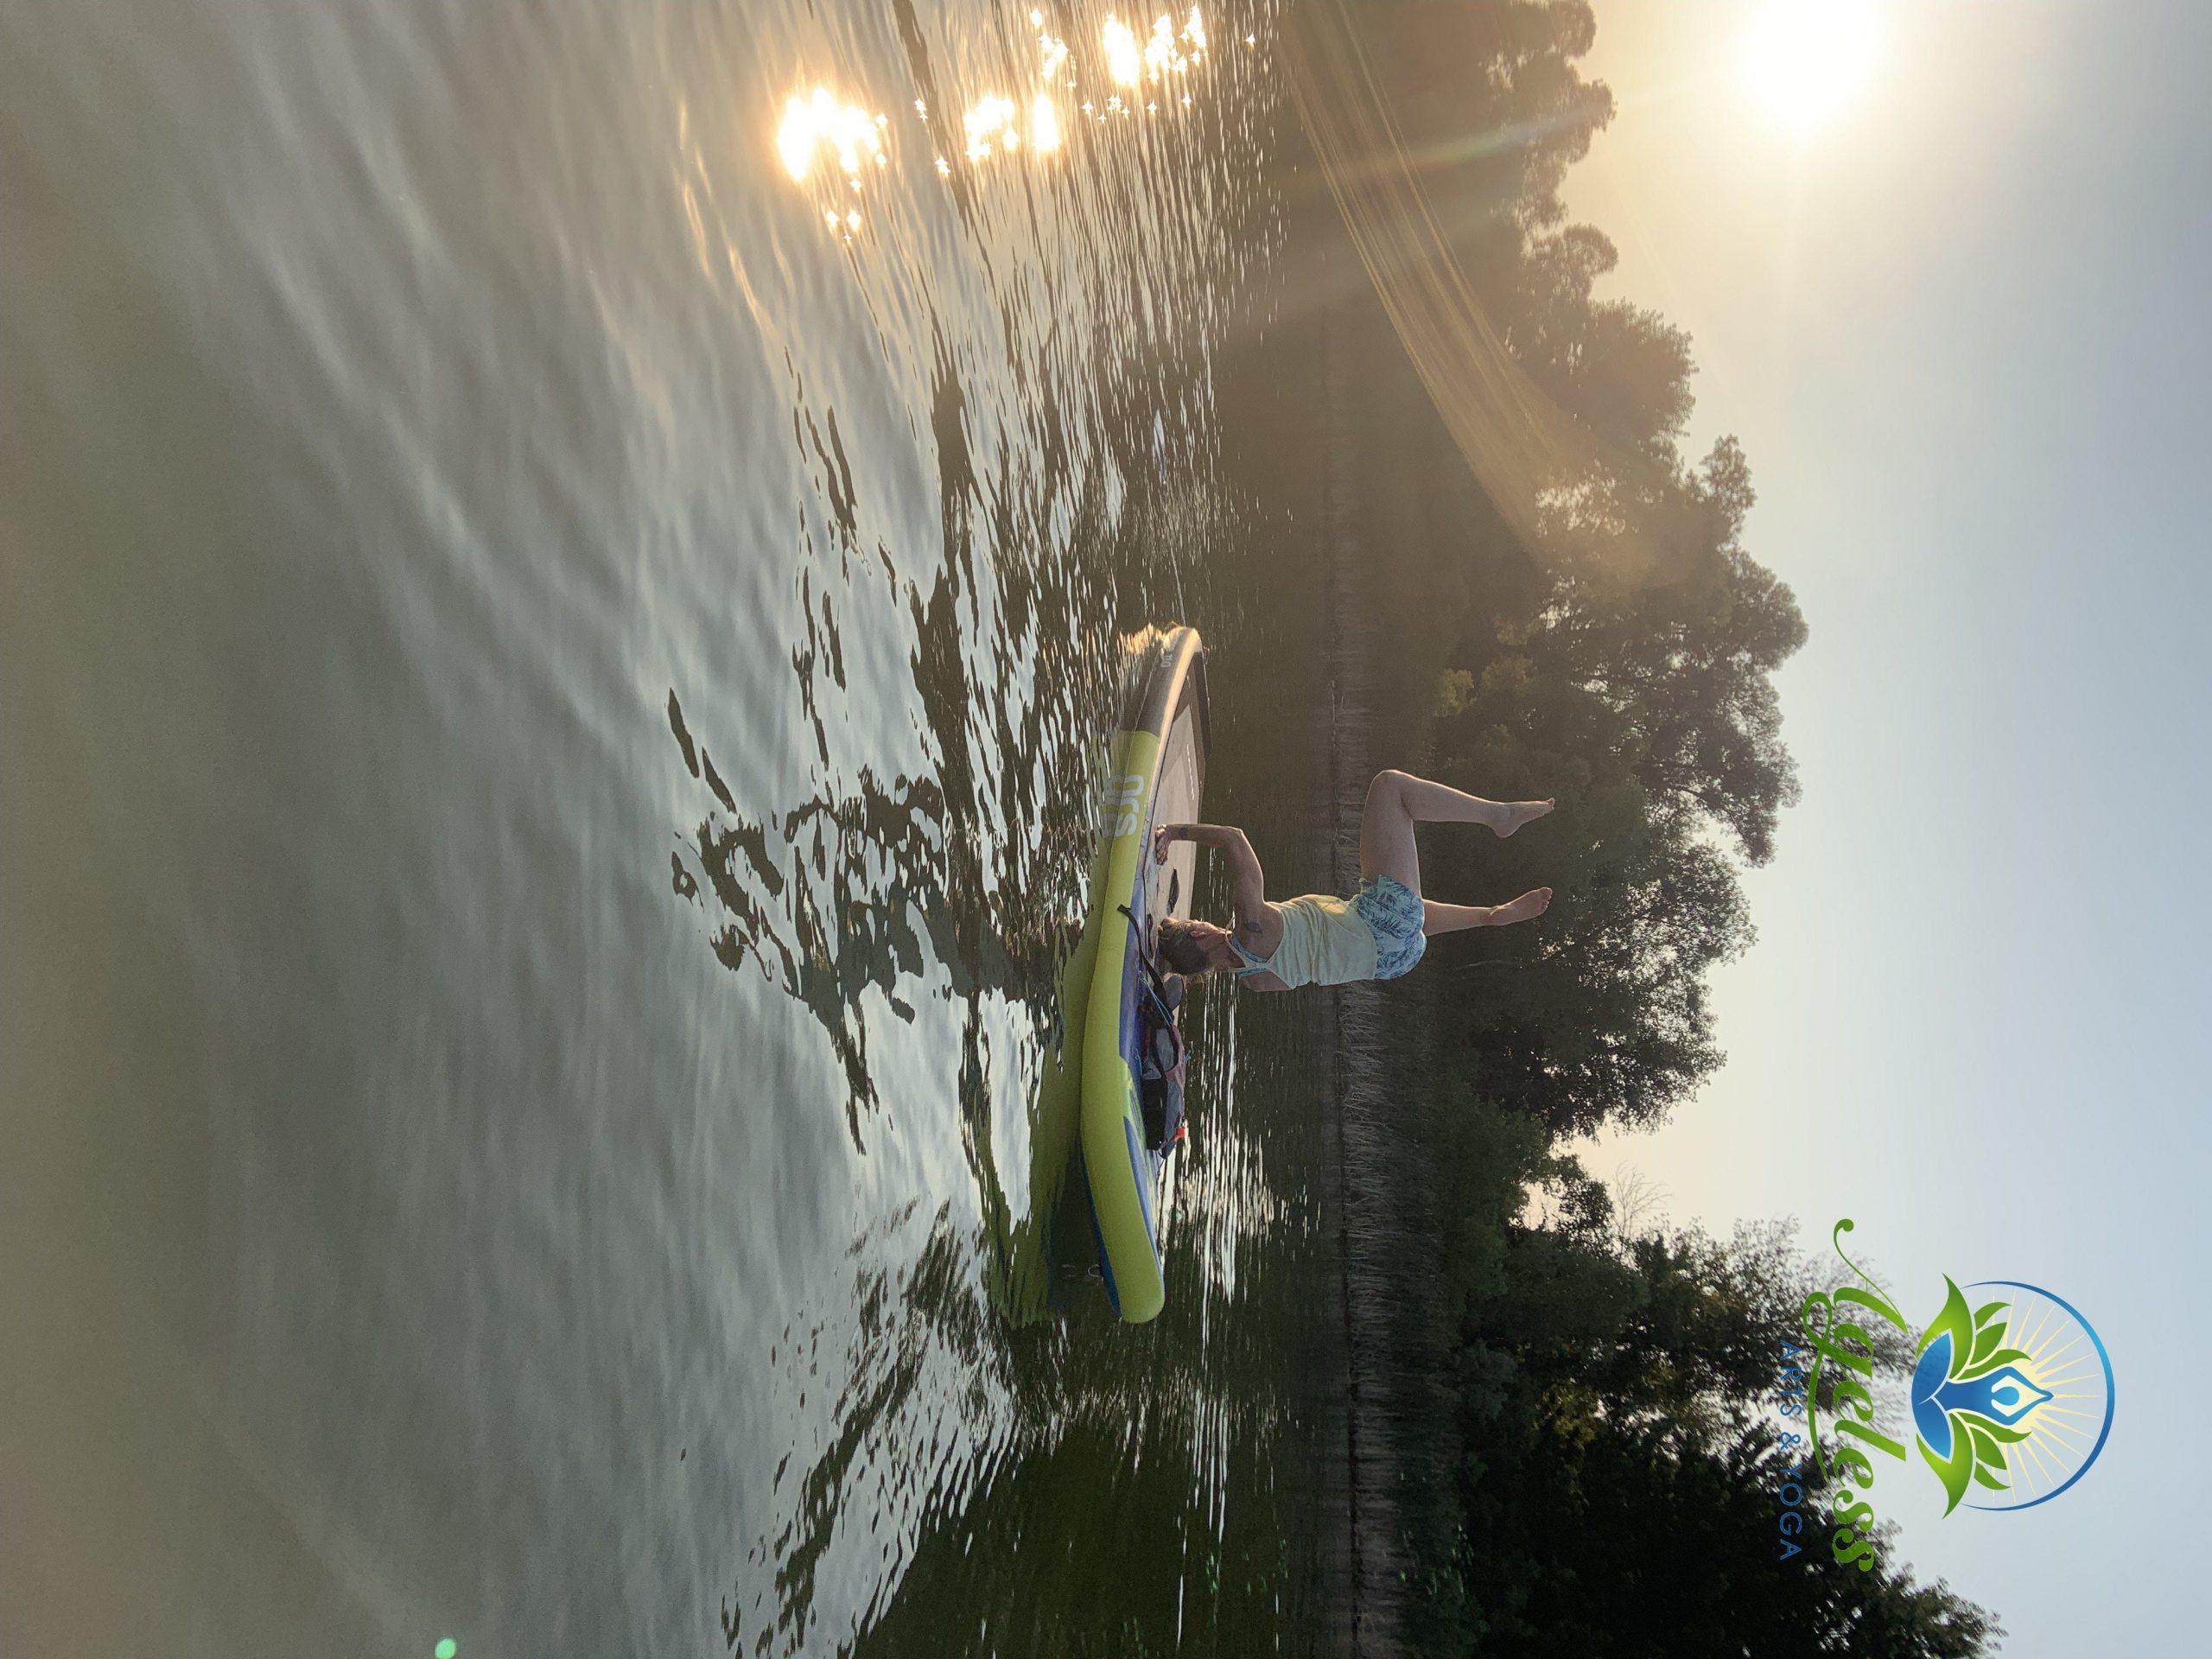 SUP Yoga Guelph Lake - July 26, 2021